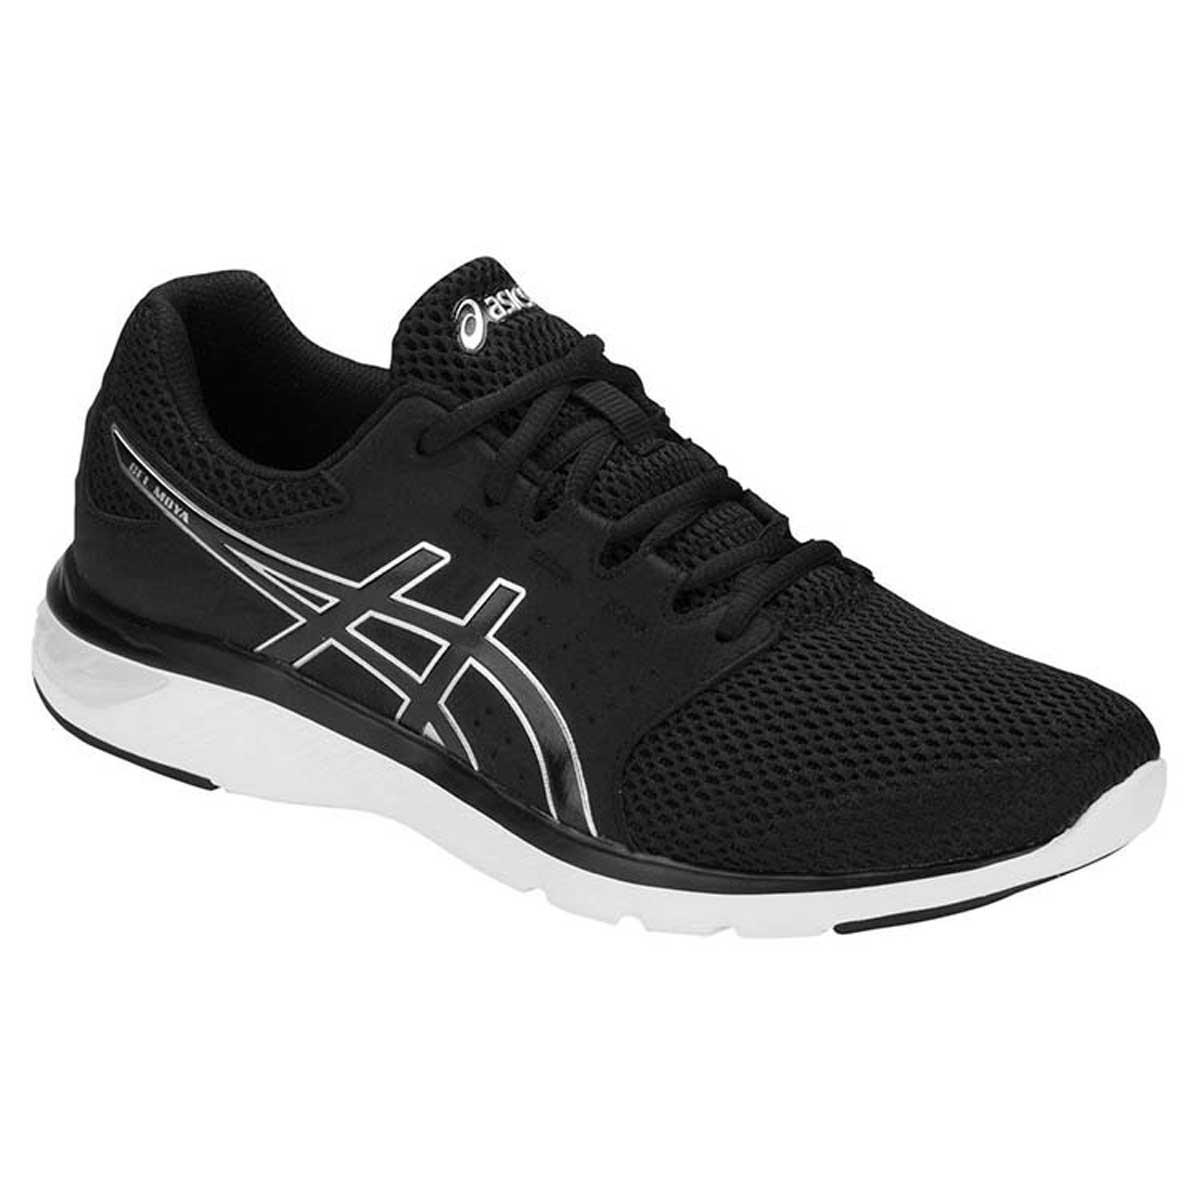 erosión Deflector celestial  Buy Asics Gel-Moya Running Shoes (Black/Silver) Online India